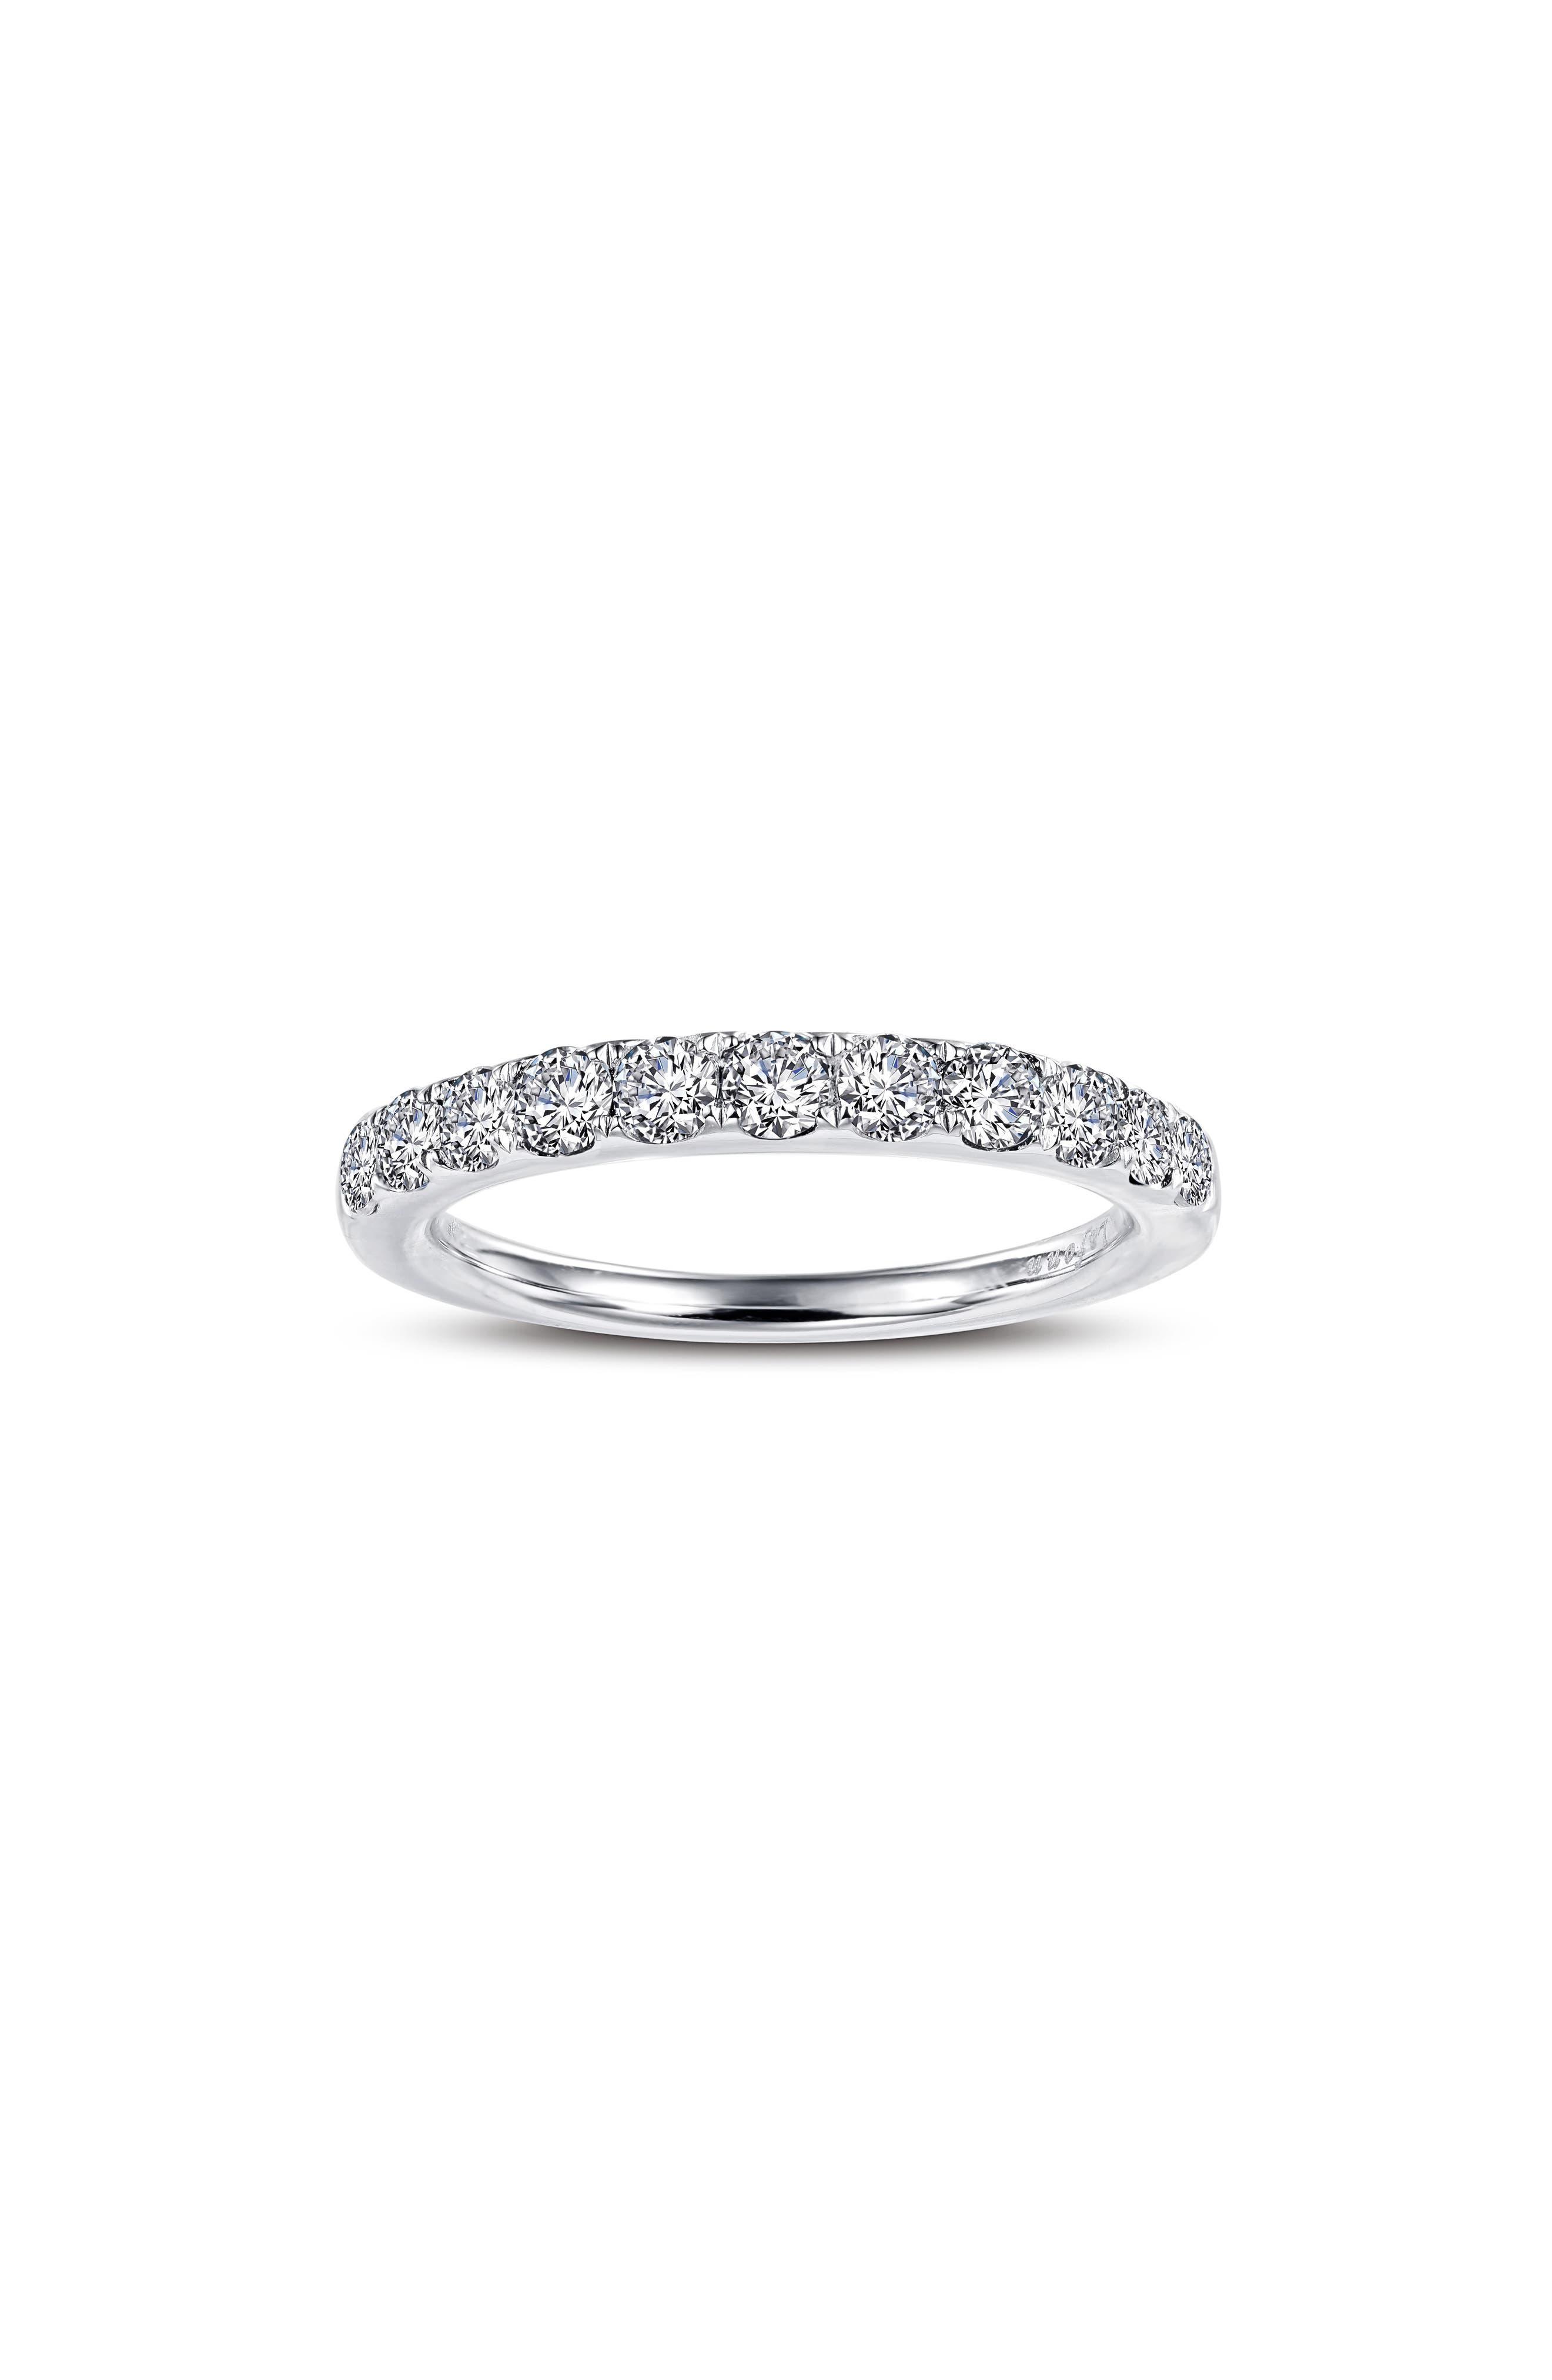 Simulated Diamond Birthstone Band Ring,                             Main thumbnail 1, color,                             APRIL - CLEAR/ SILVER